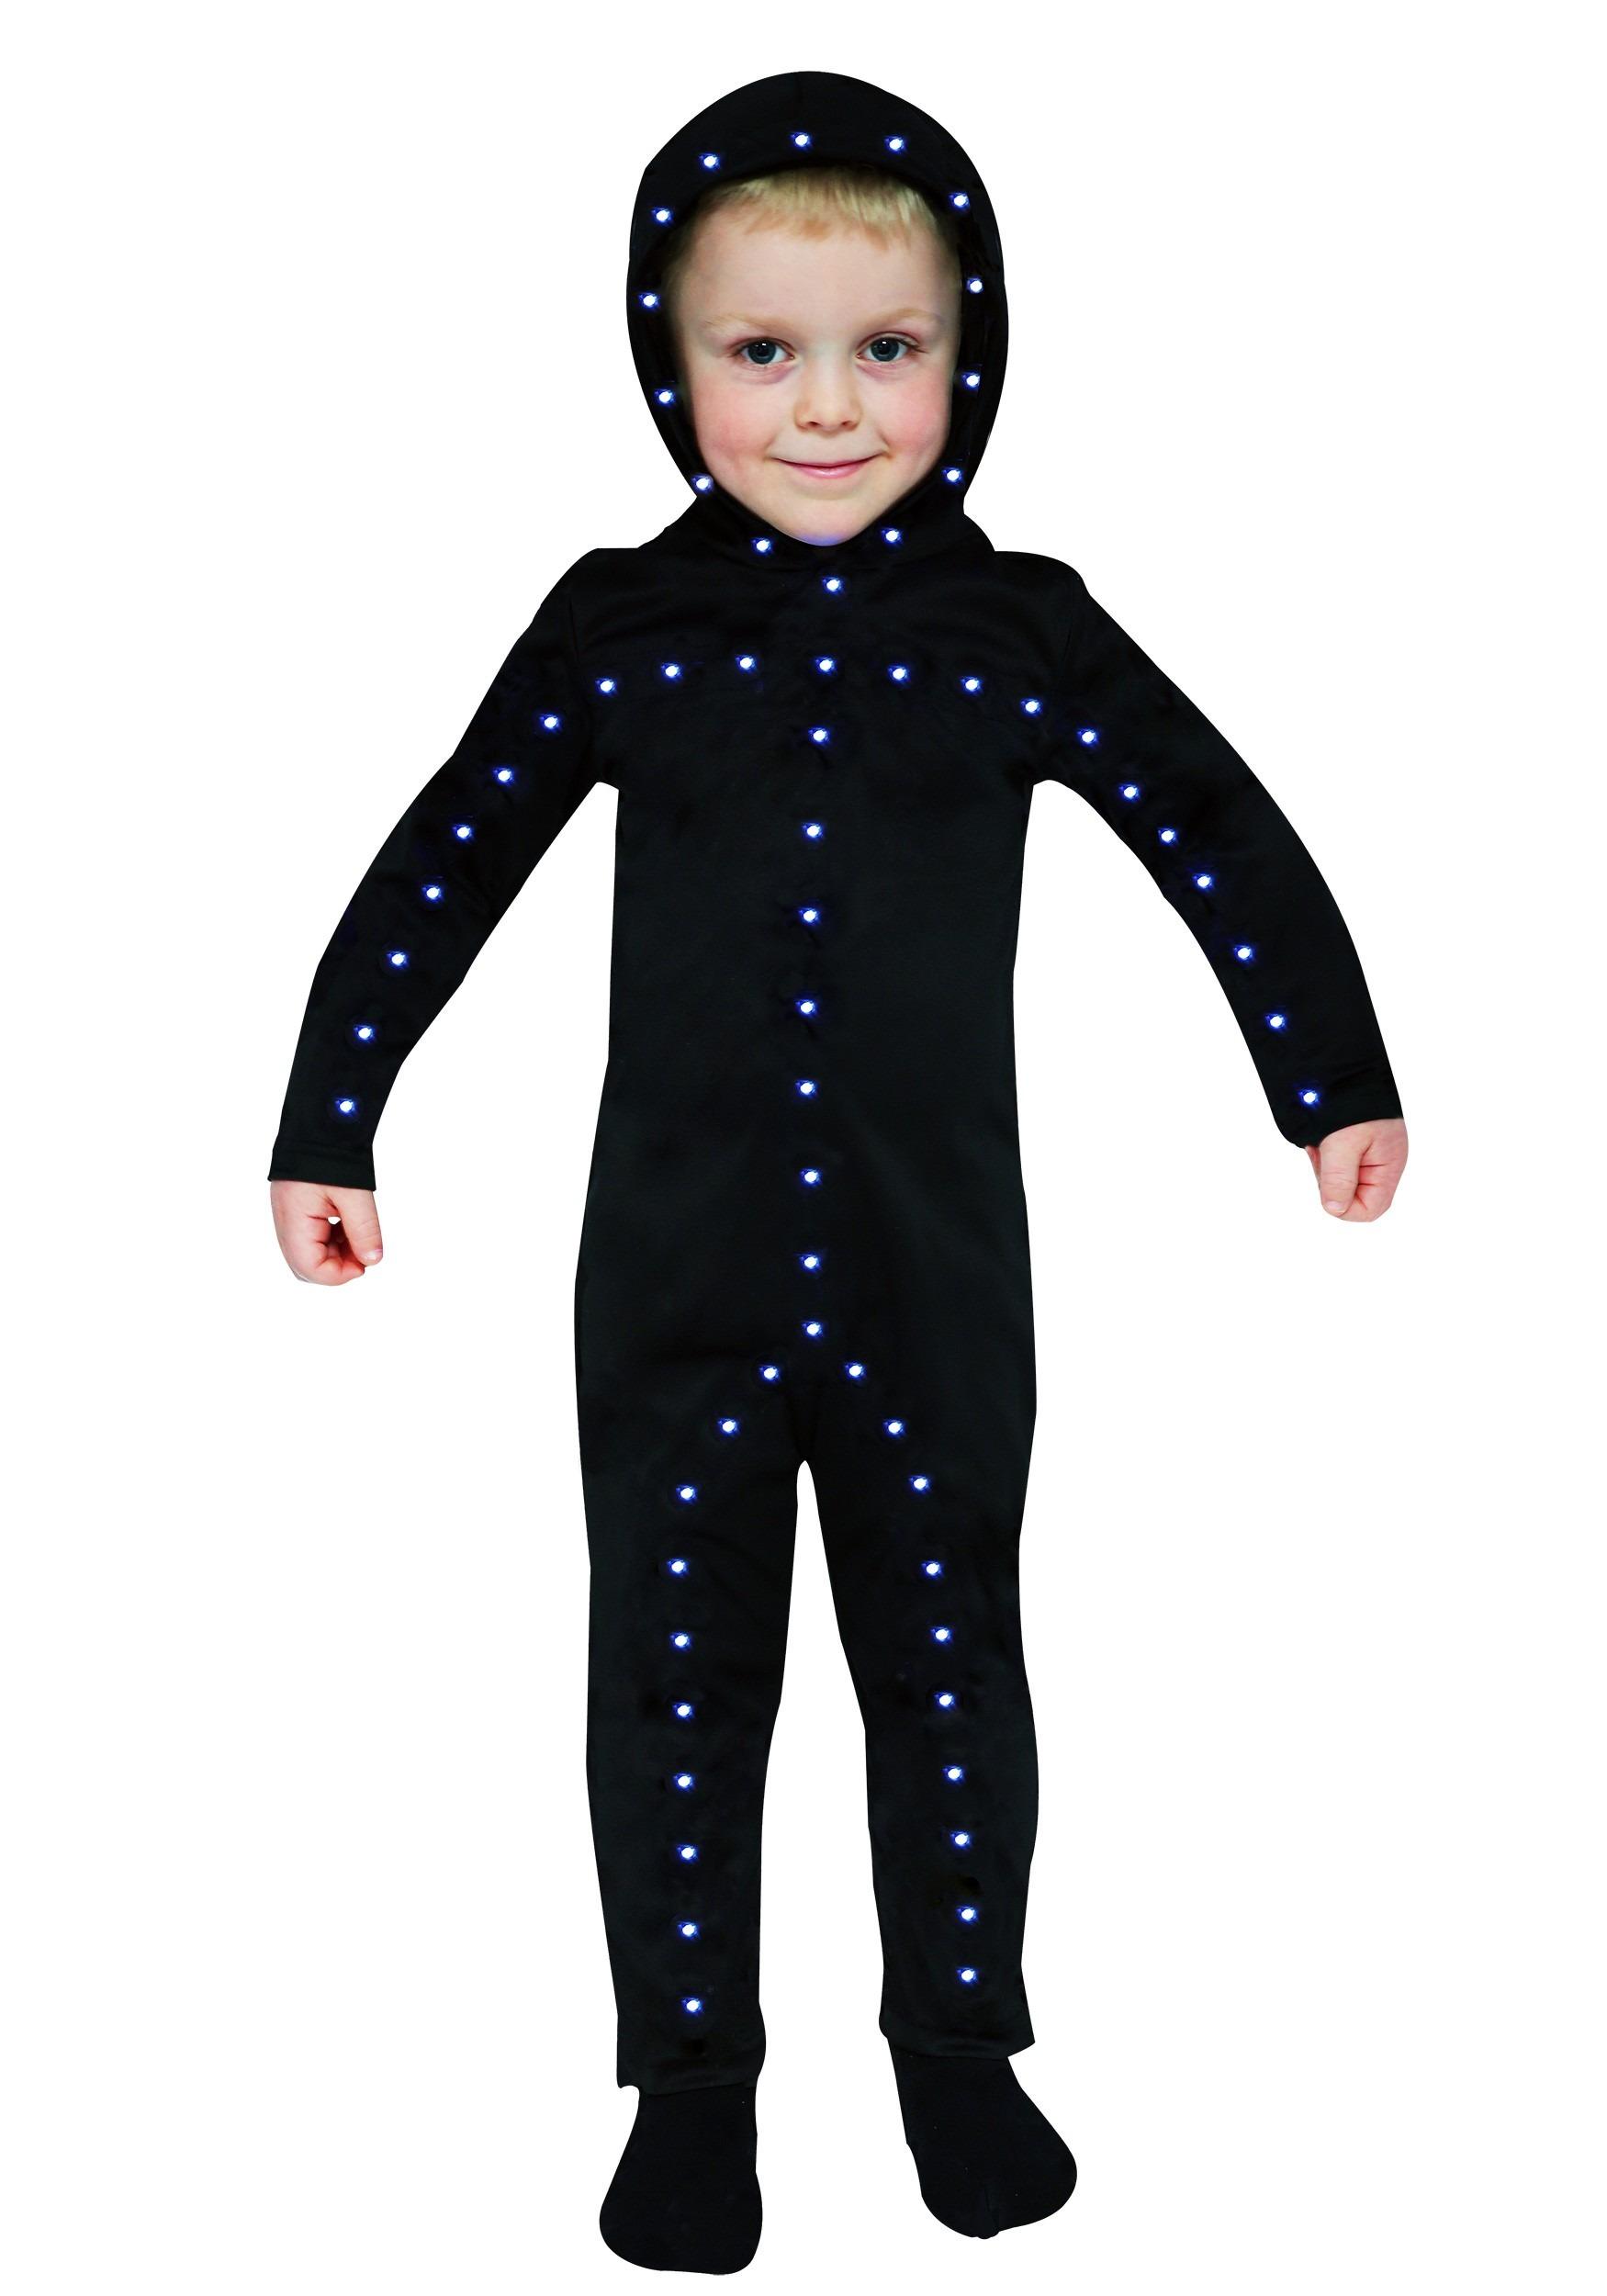 Lighted Toddler Stick Man Costume